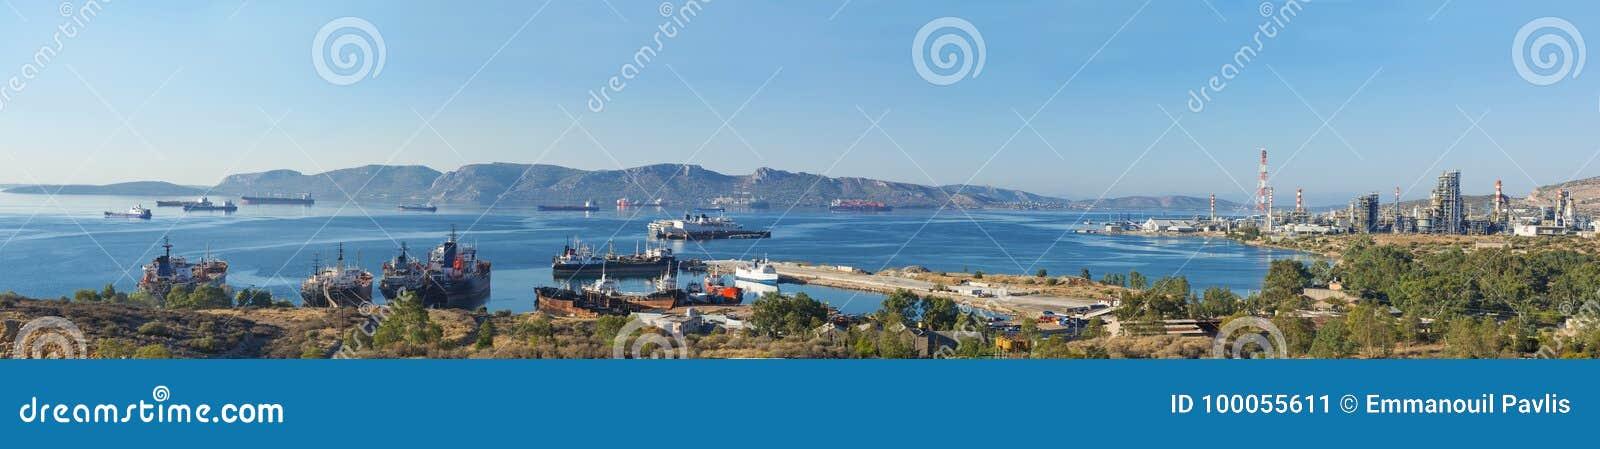 Eleusis zatoka, Attica - Grecja